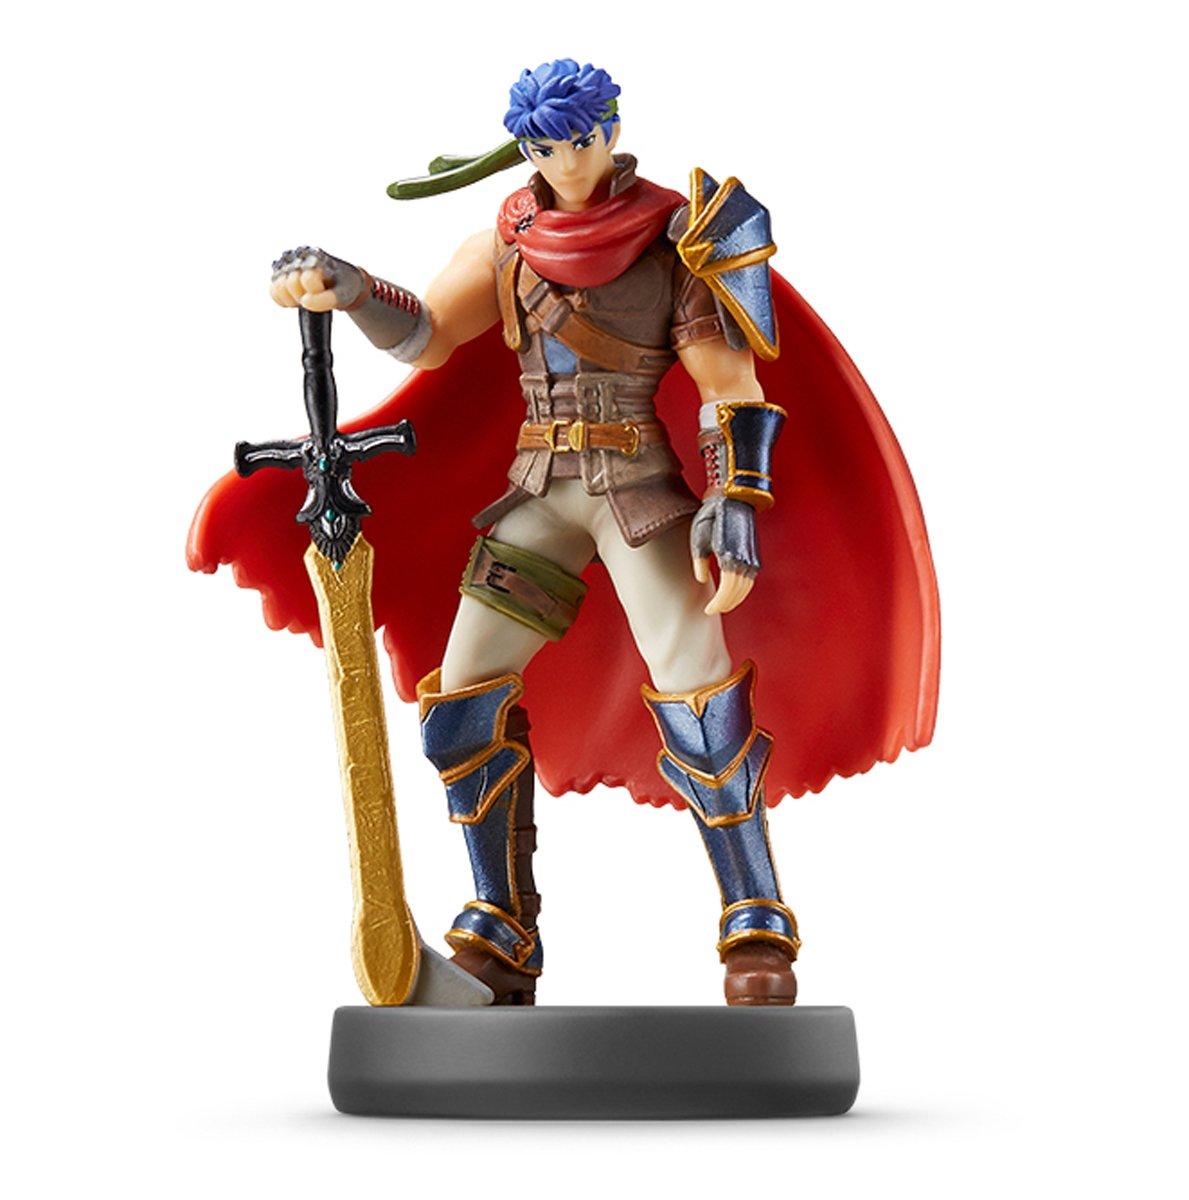 Ike amiibo - Japan Import (Super Smash Bros Series) by Nintendo